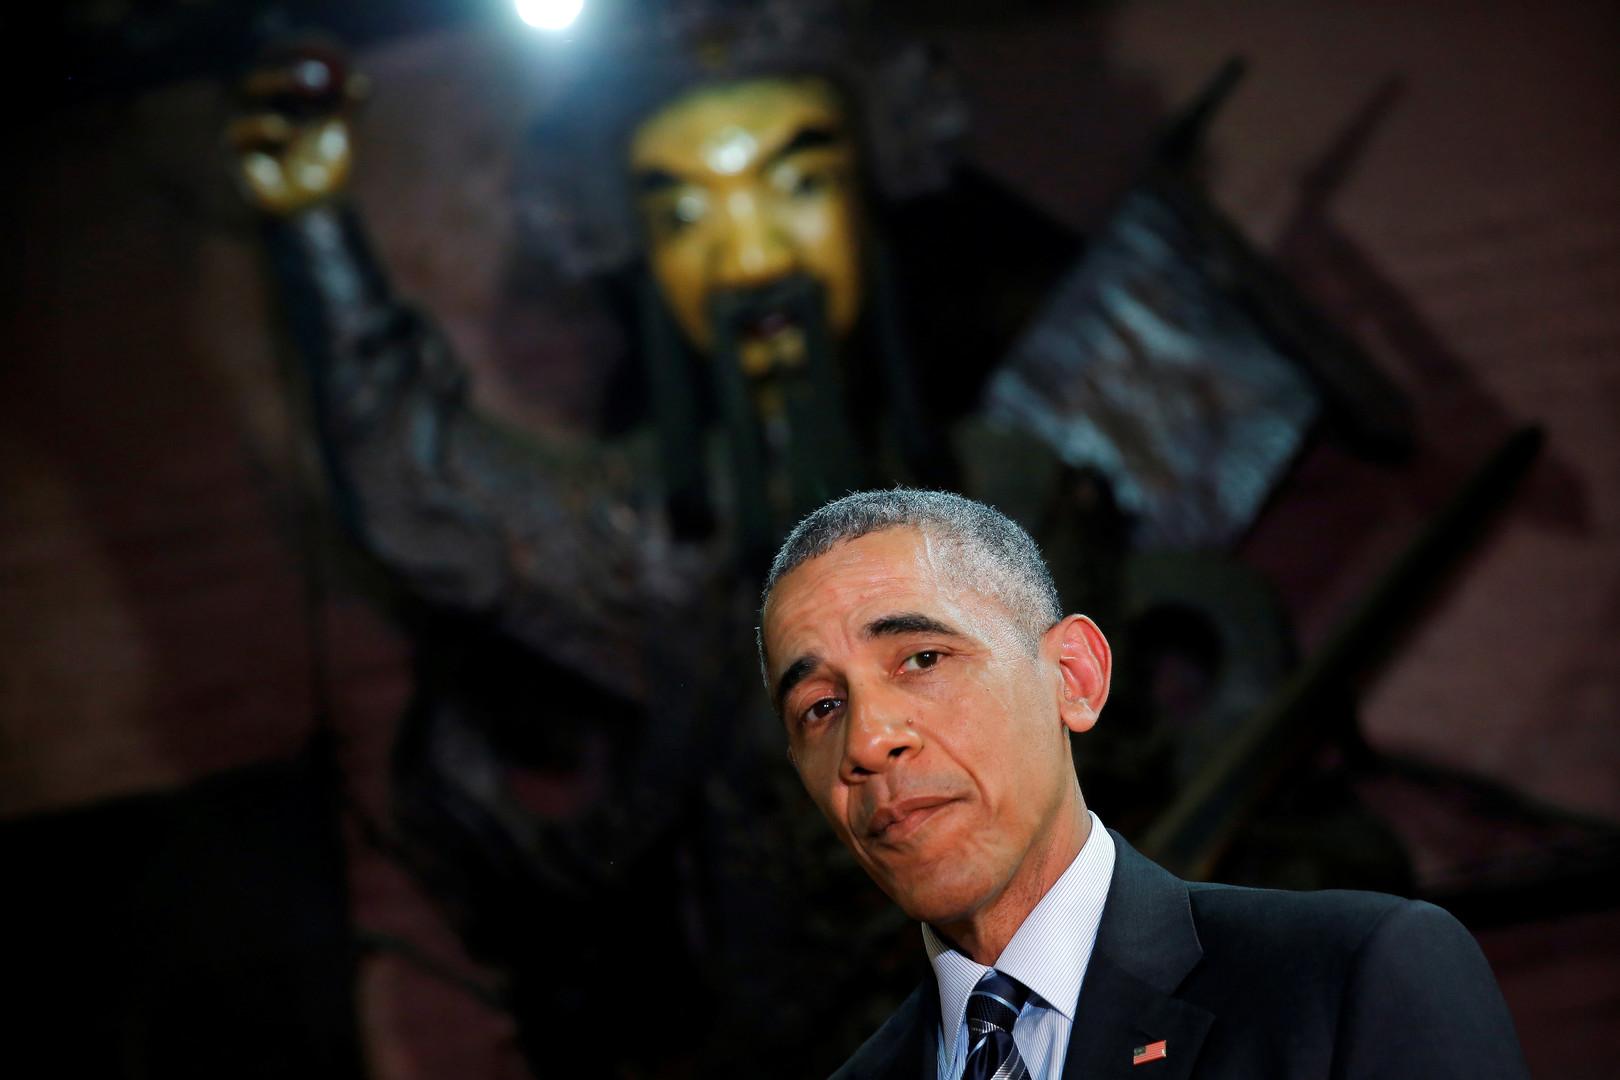 Obamas Außenpolitik: 'Pivot to Asia' - Der Feind heißt China